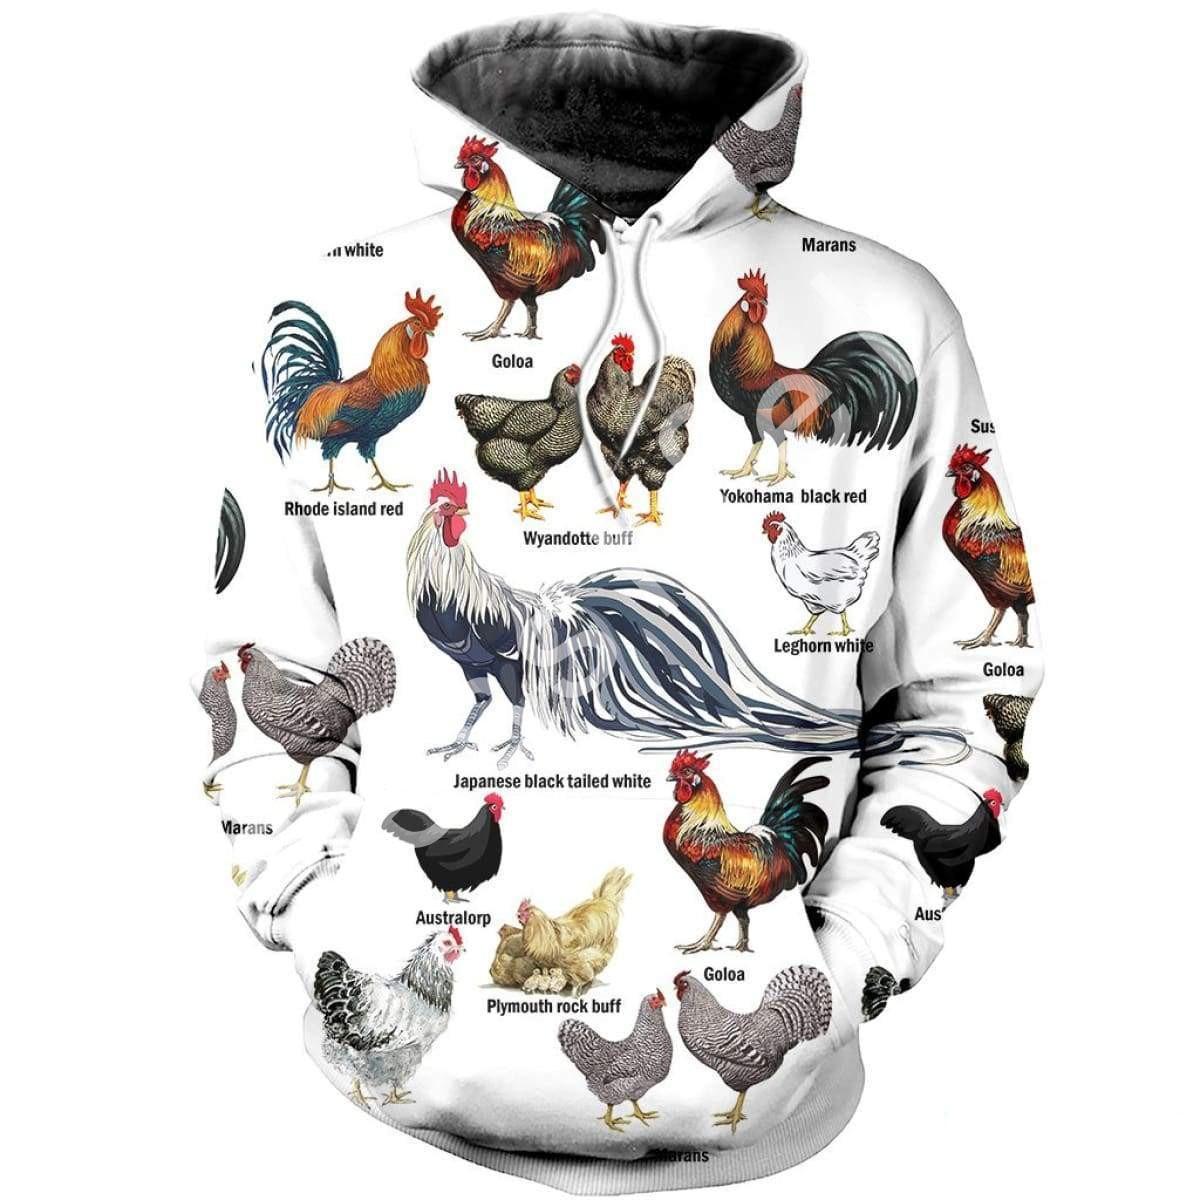 Tessffel animal chicken bird MenWomen HipHop Sweatshirts Autumn Hoody Pullover Tracksuits Casual Crewneck fit colorful Style 6|Hoodies & Sweatshirts| |  - title=